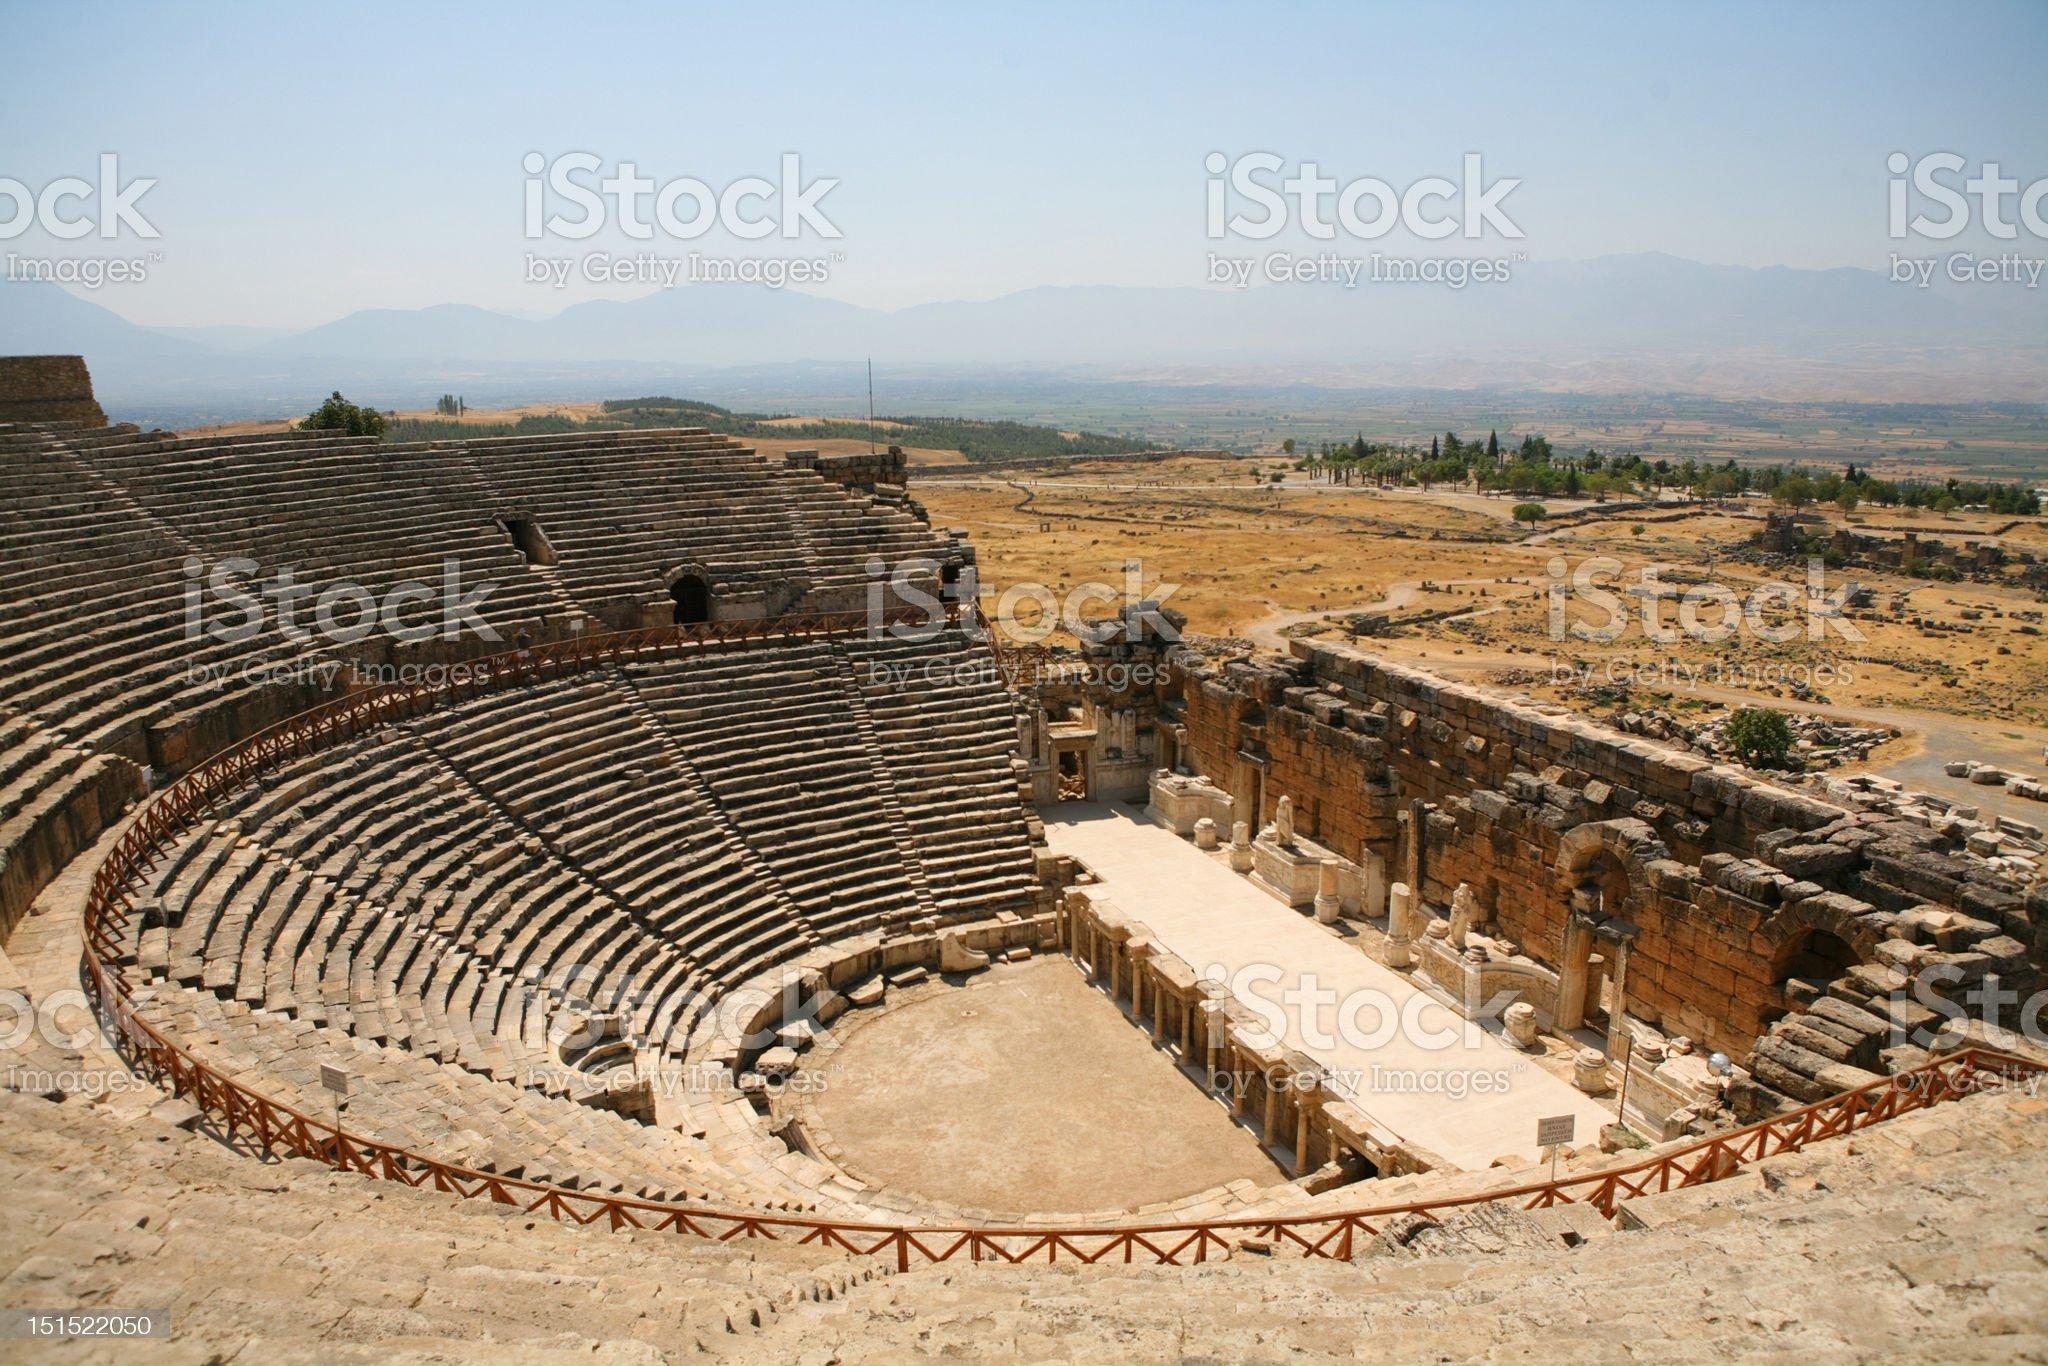 Old Roman Amphitheater royalty-free stock photo